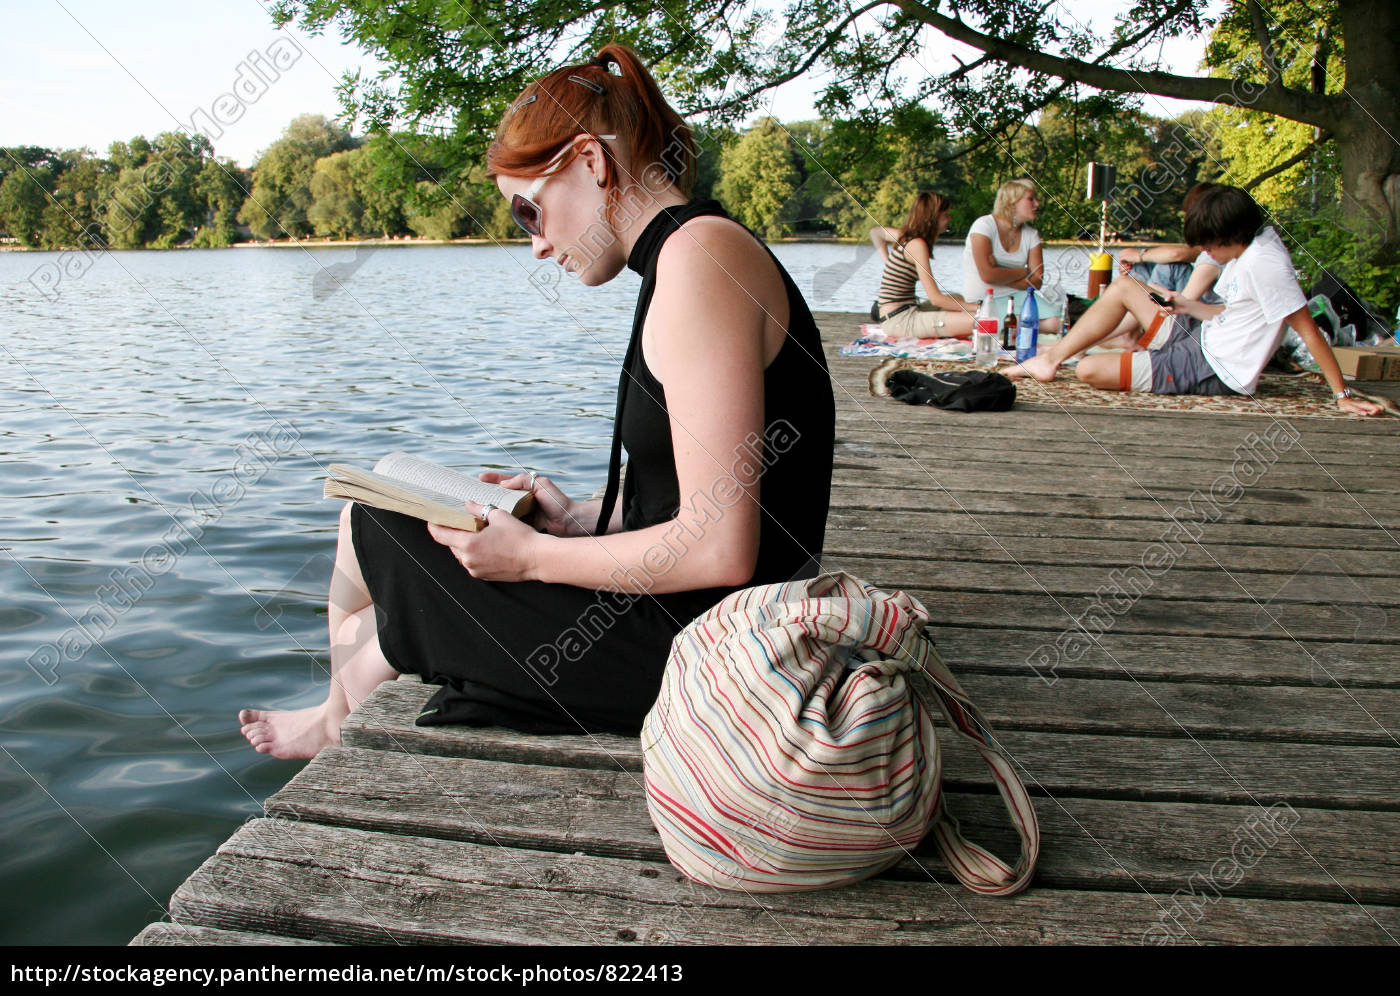 young, woman, reading, at, the, lake - 822413